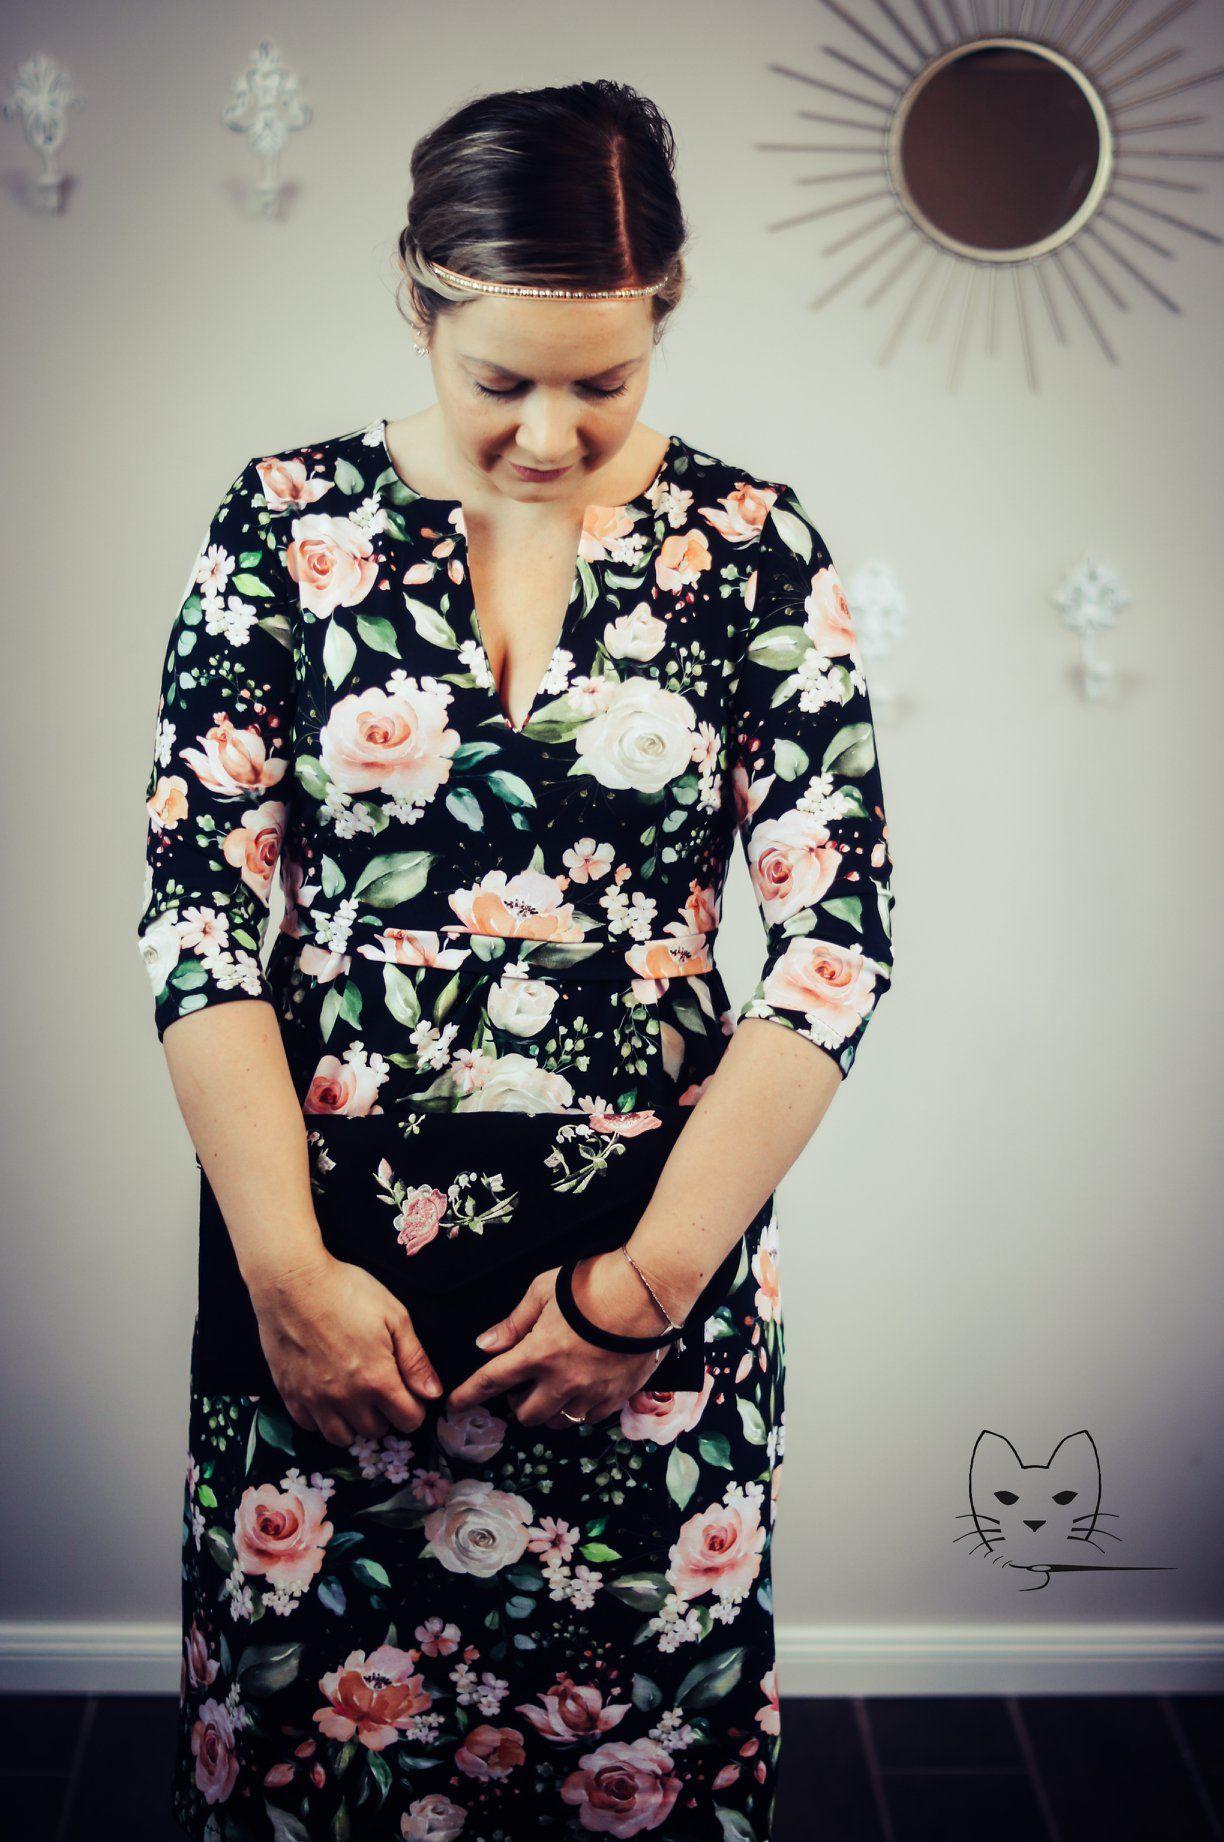 elisabeth | kleid nähen, blumige kleider, frühlingskleid